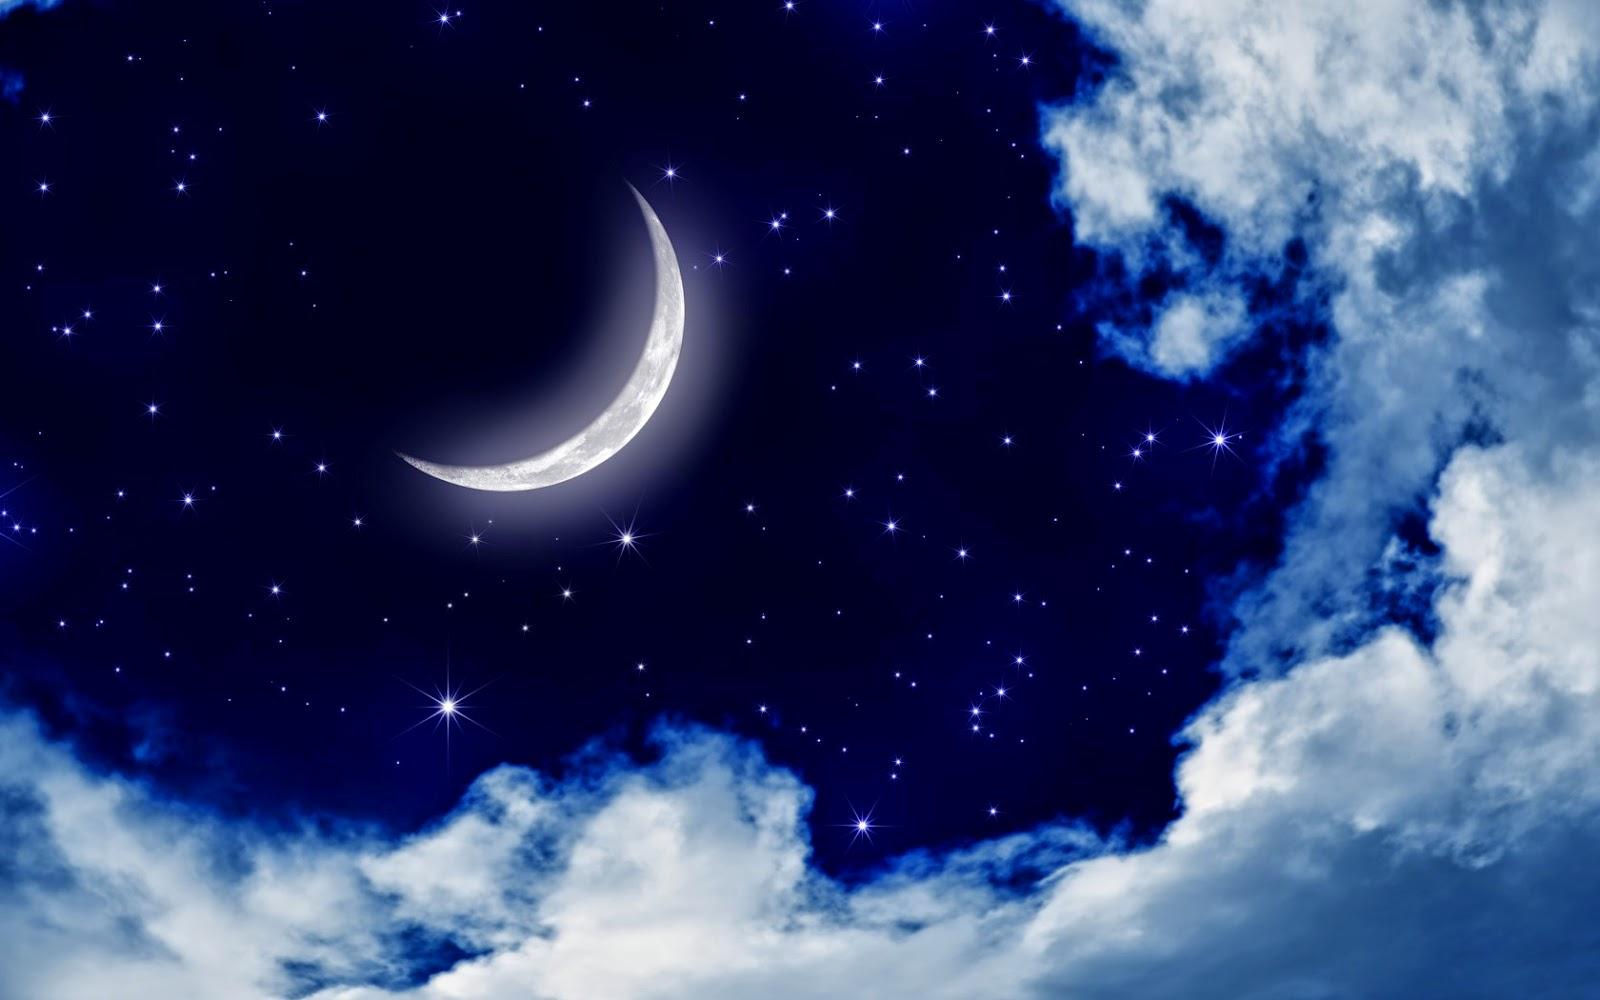 2015 Full Moon On Christmas | newhairstylesformen2014.com